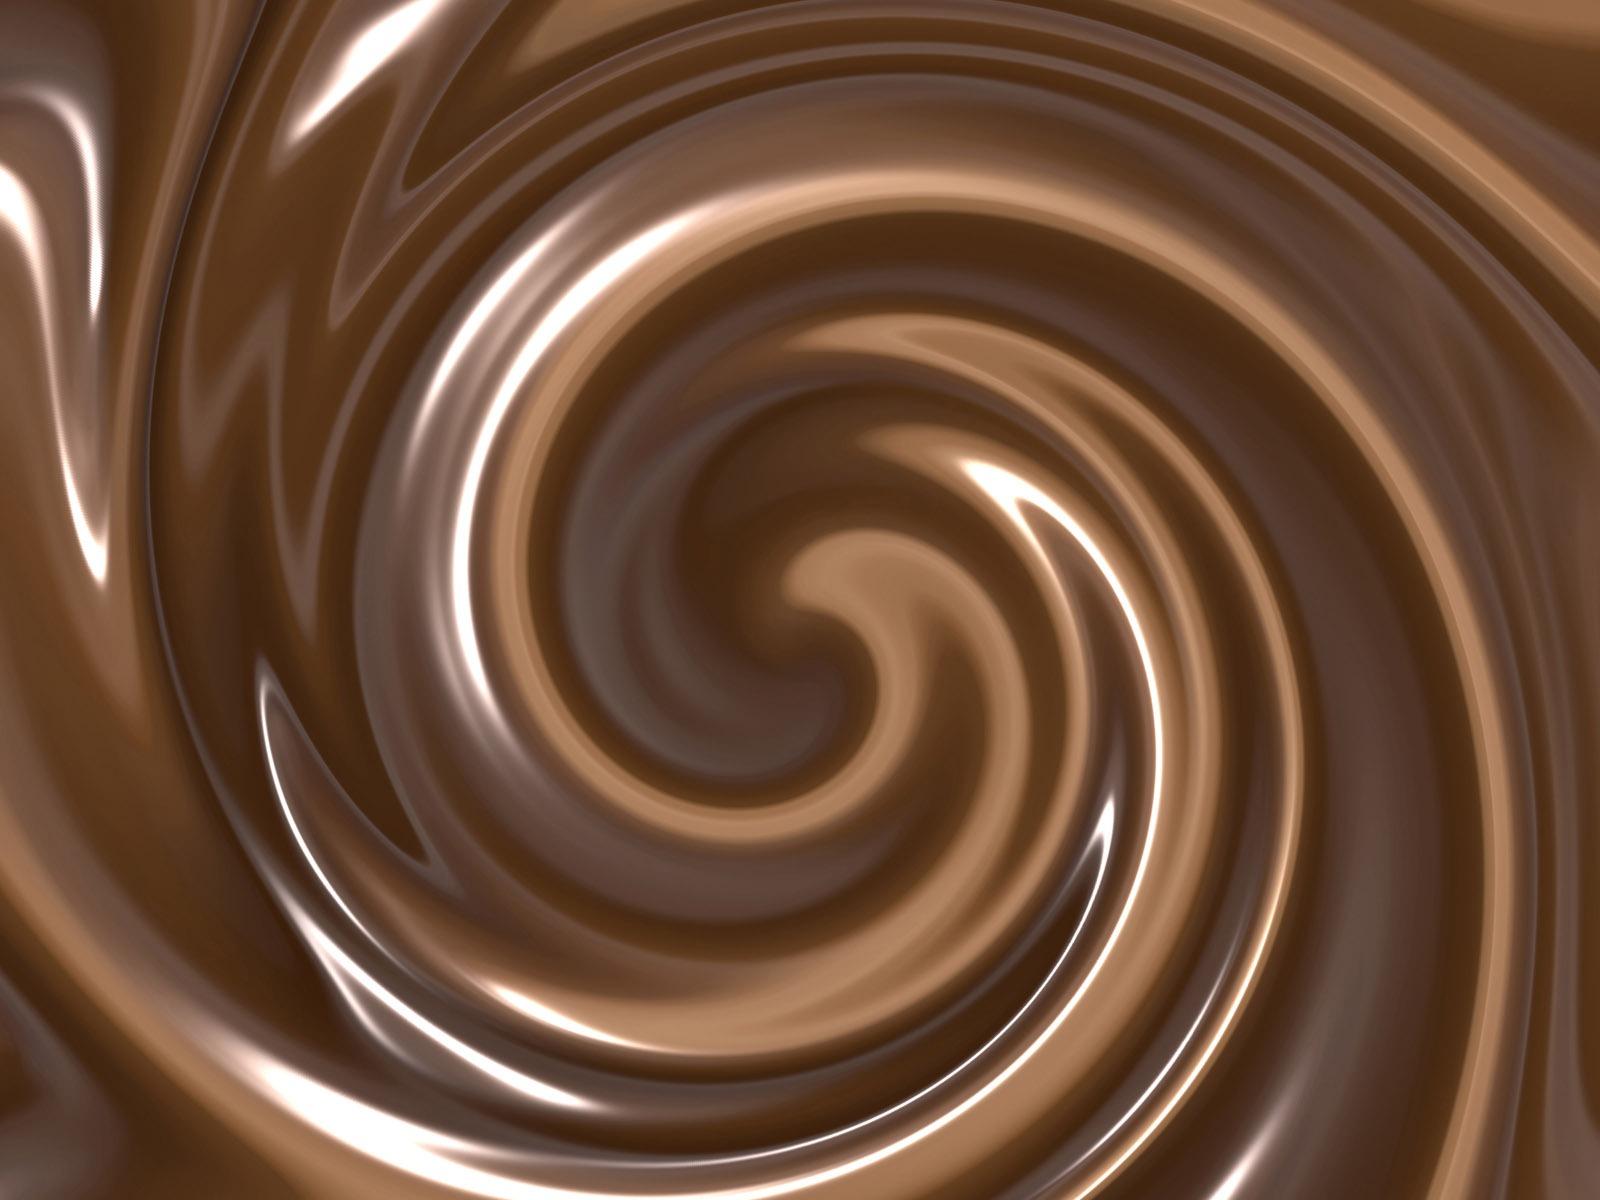 Chocolate or Chocolate